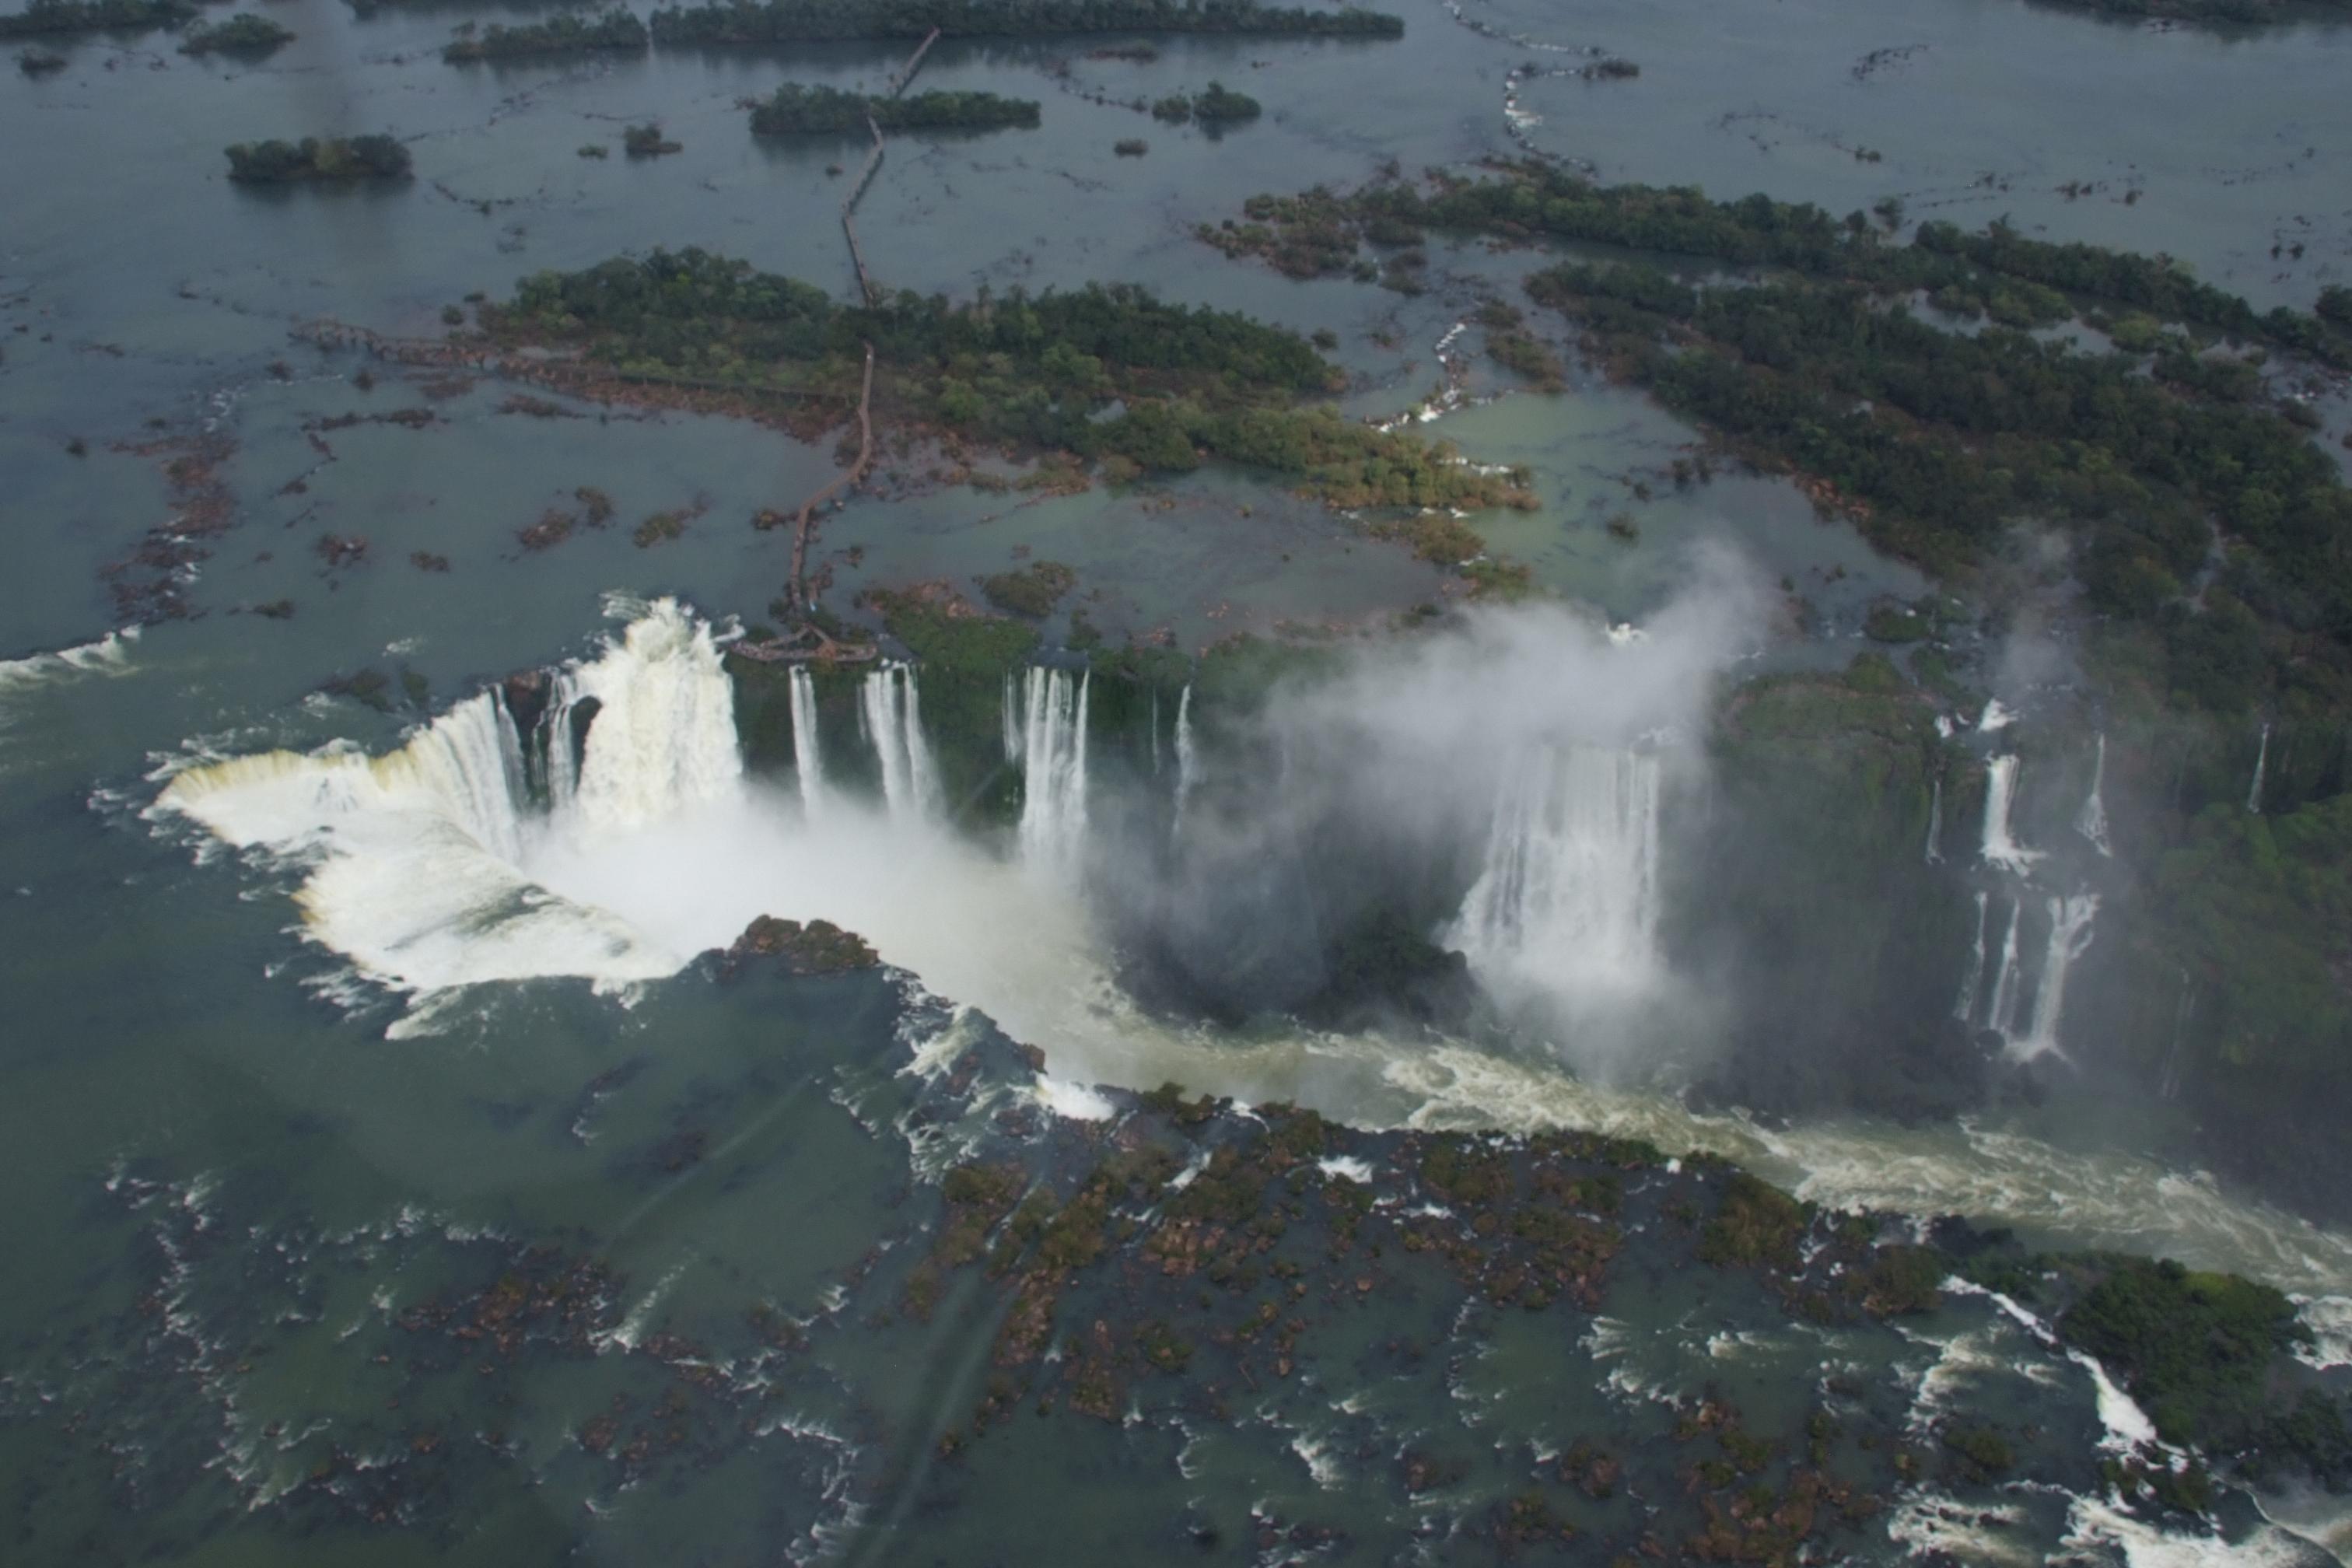 Iguazu Falls Helicopter Tours Price